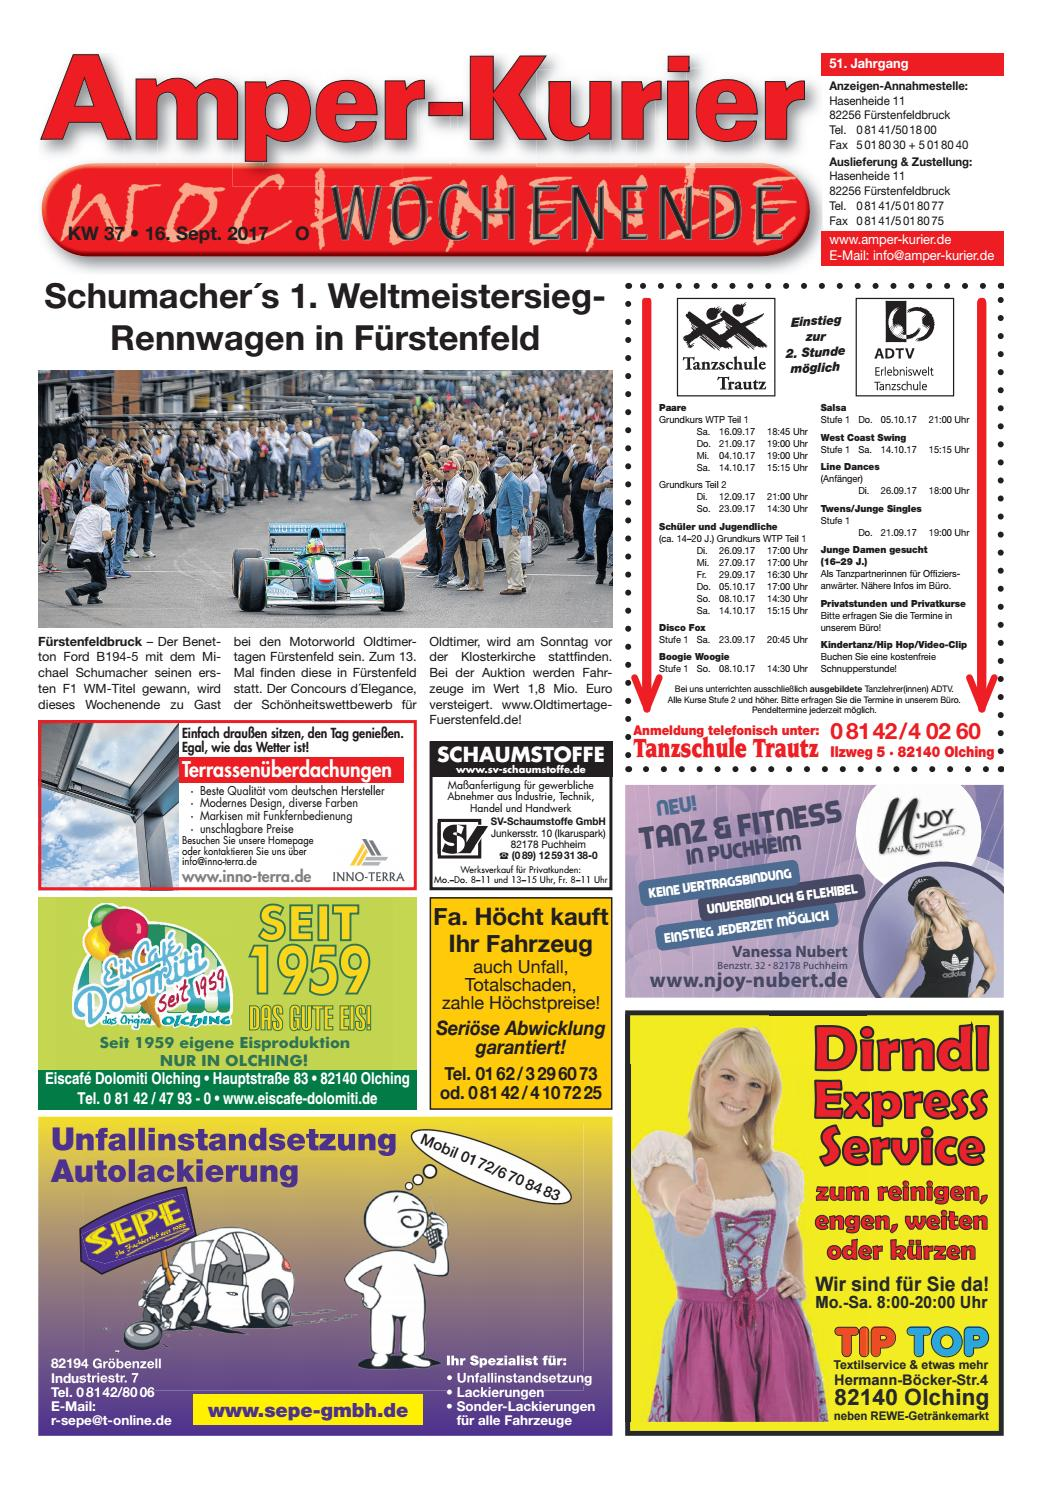 Amper-Kurier online by Datech - issuu